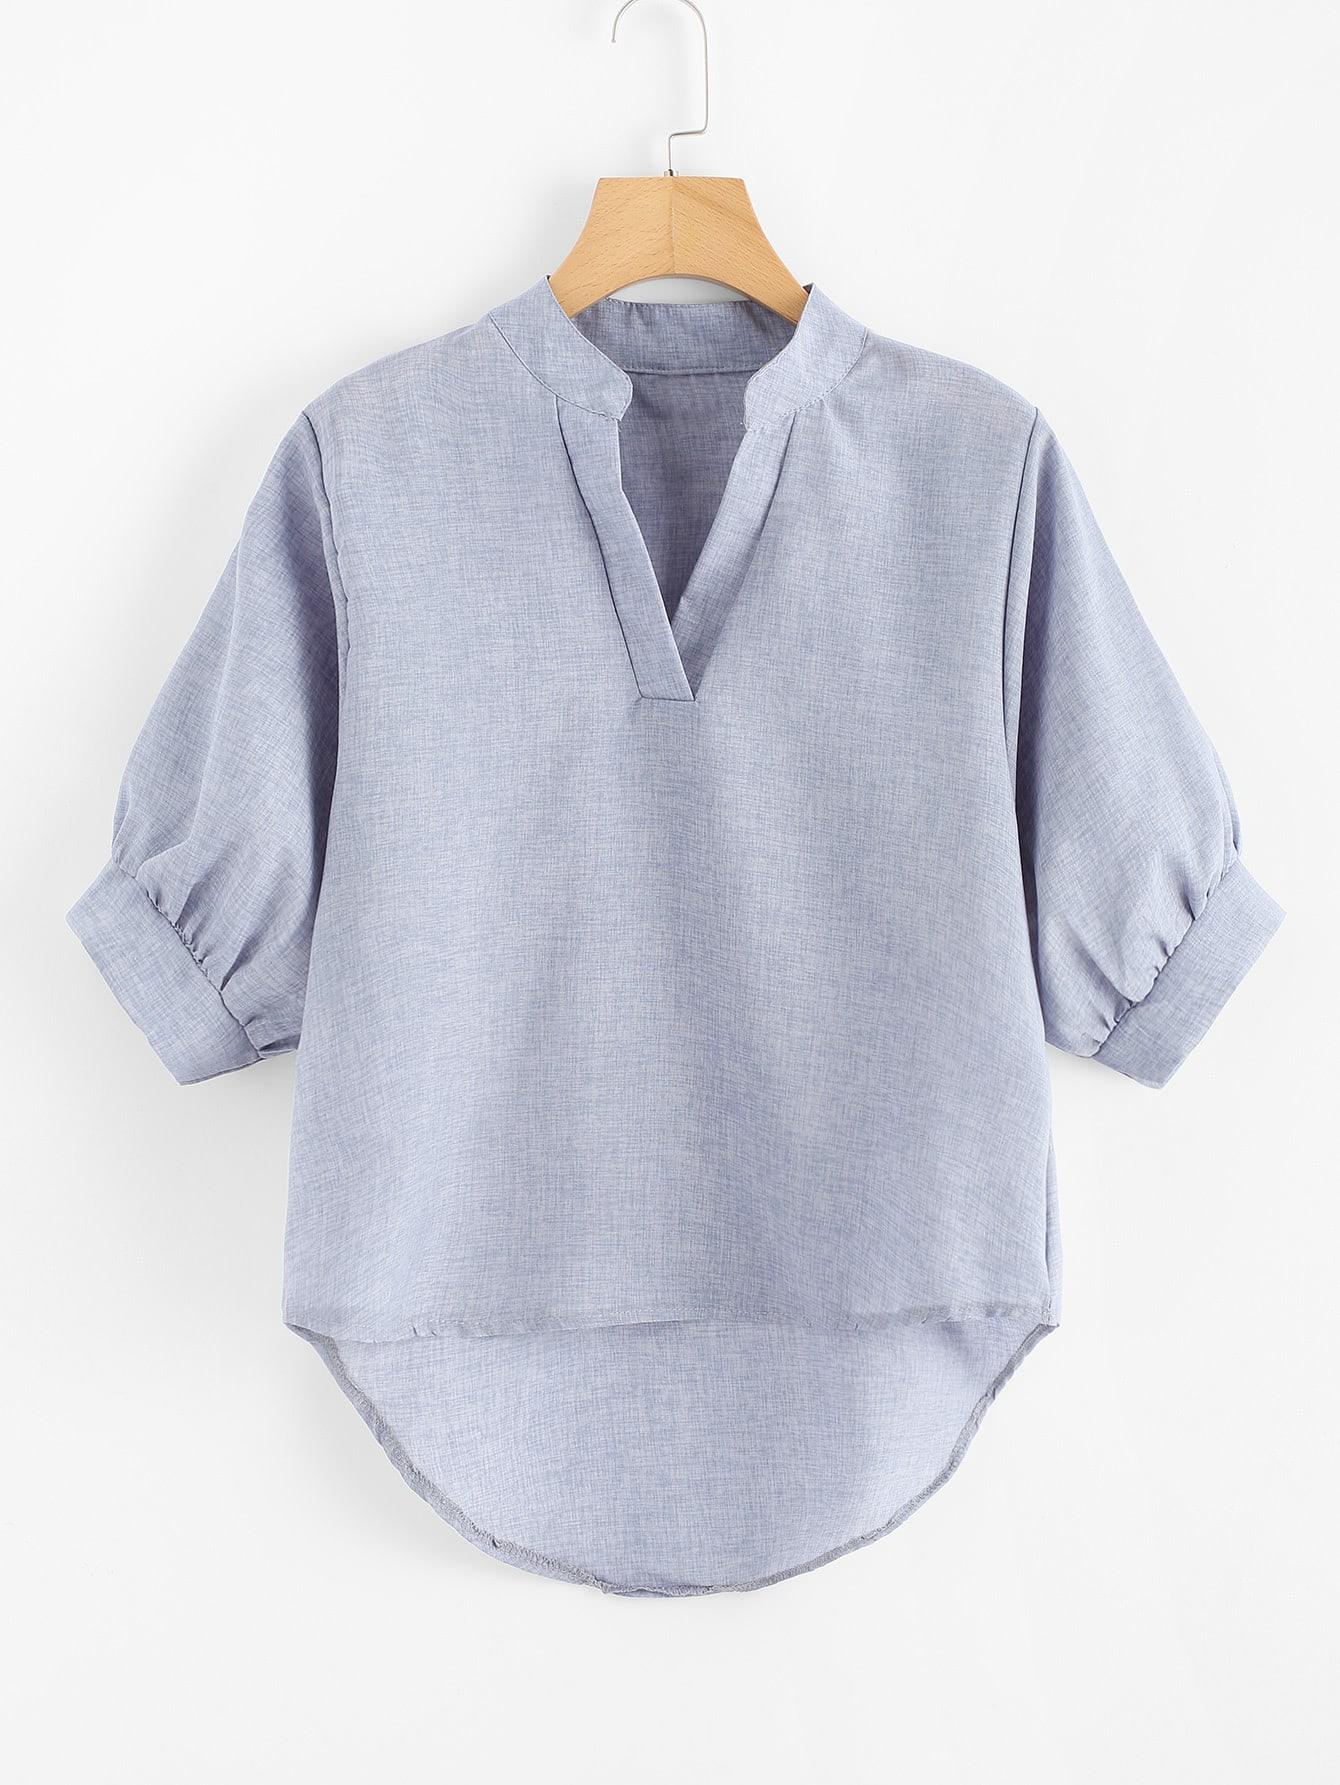 Купить Модная асимметричная блуза, рукав-фонарик, null, SheIn